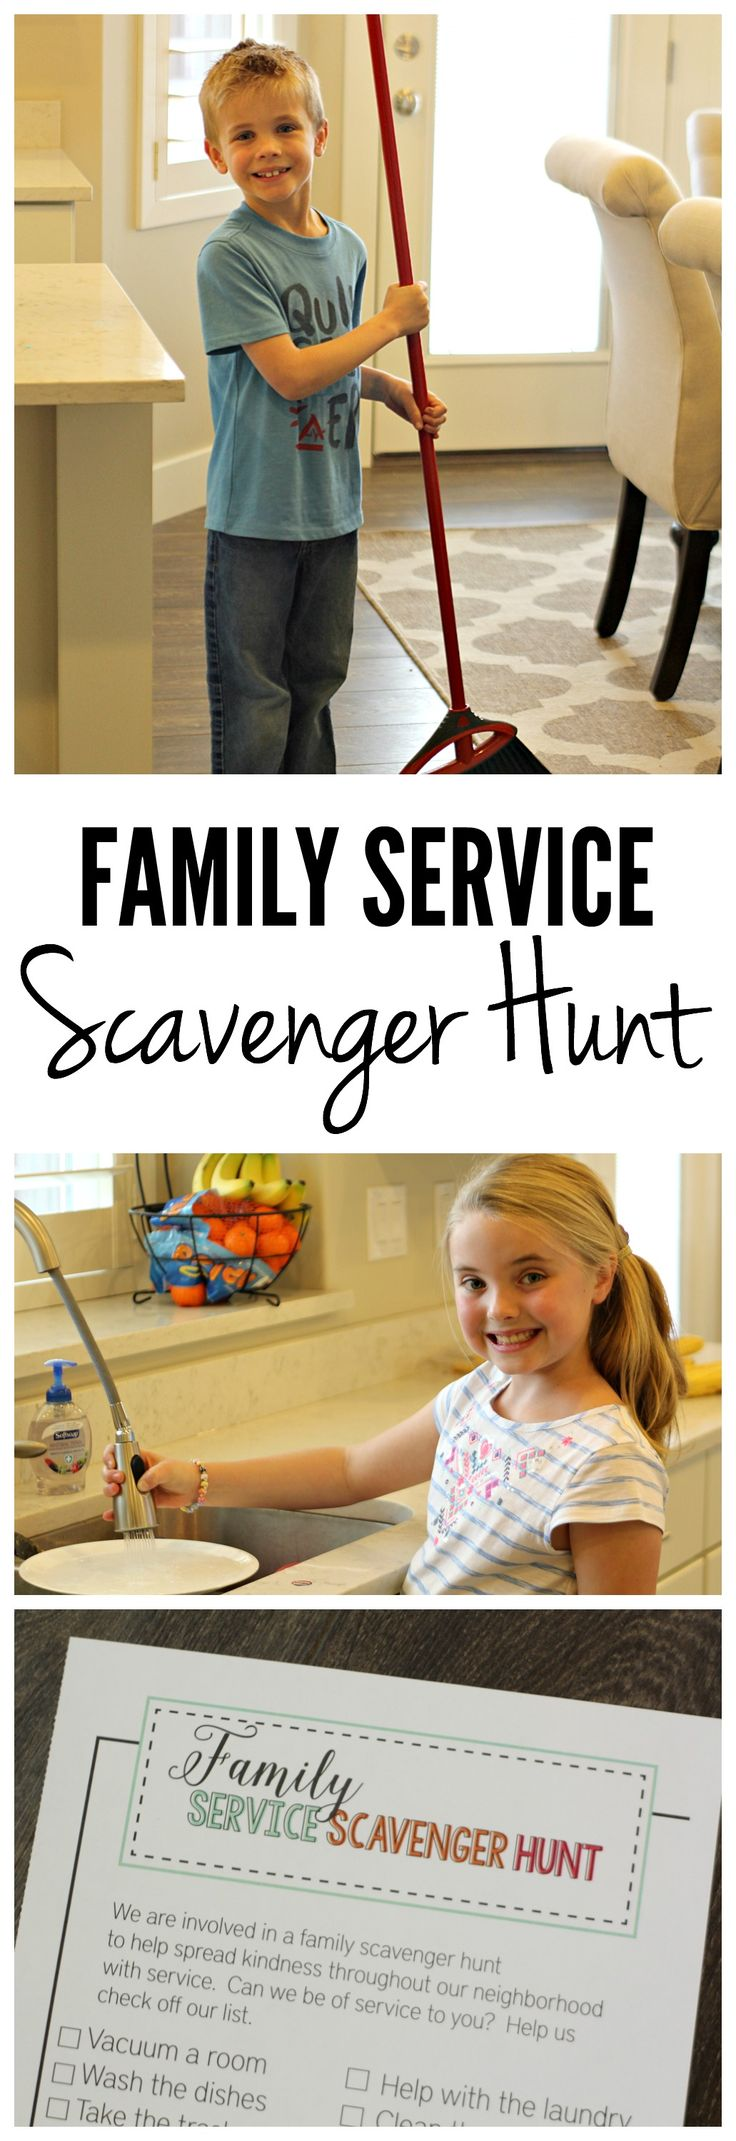 Family Service Scavenger Hunt on SixSistersStuff.com